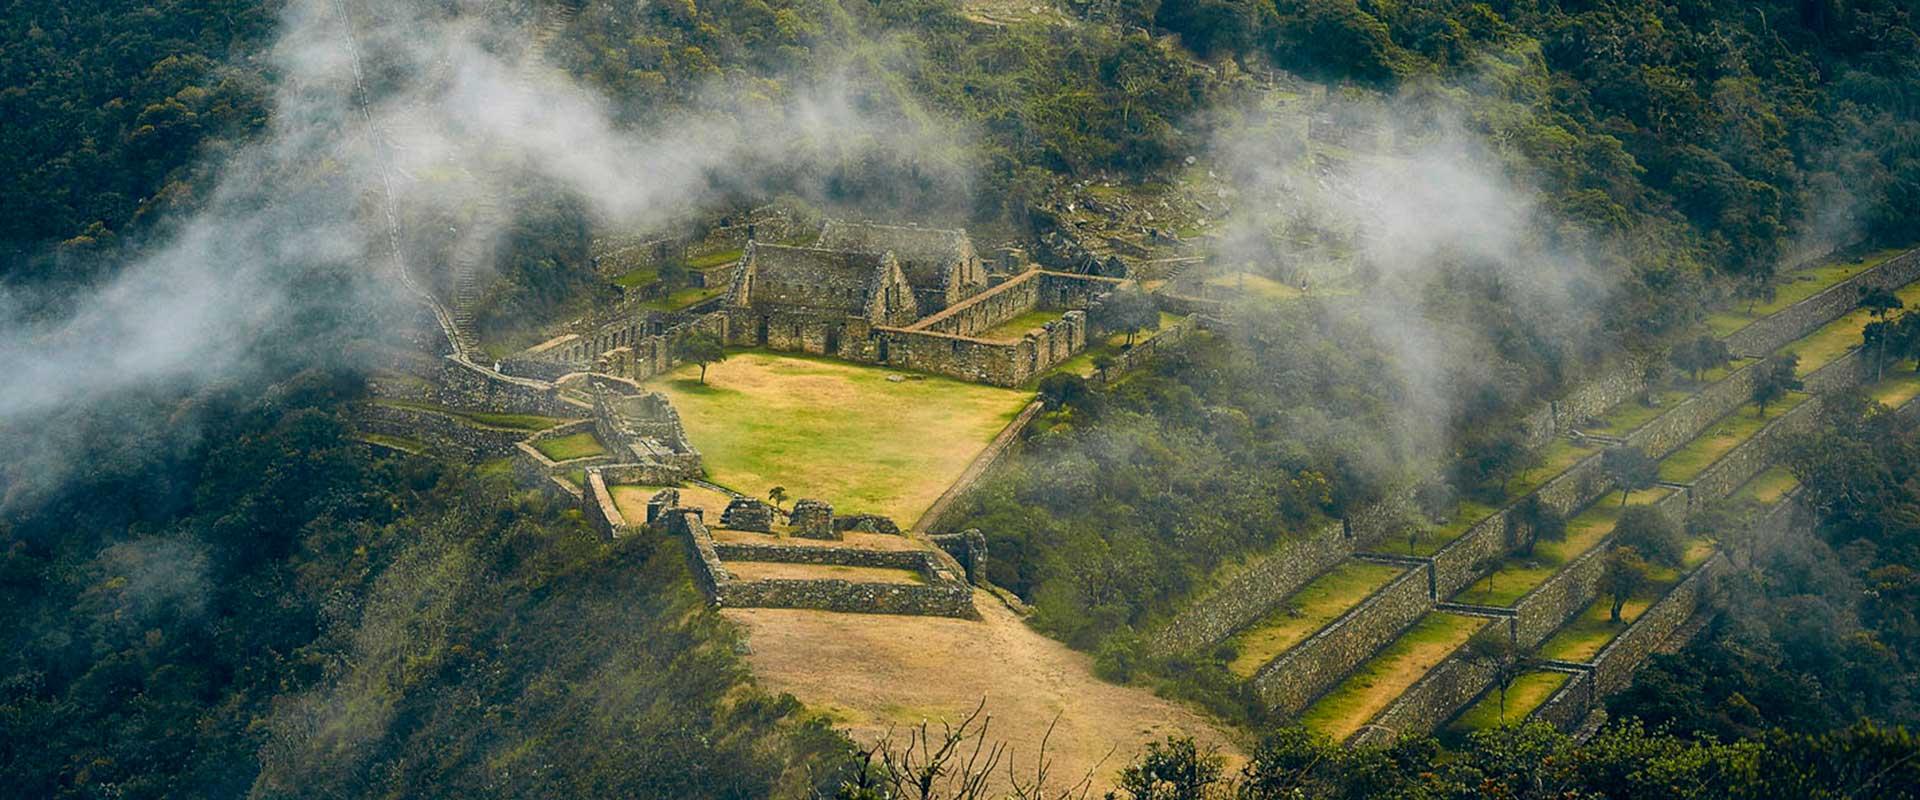 Choquequirao Trek to Machu Picchu